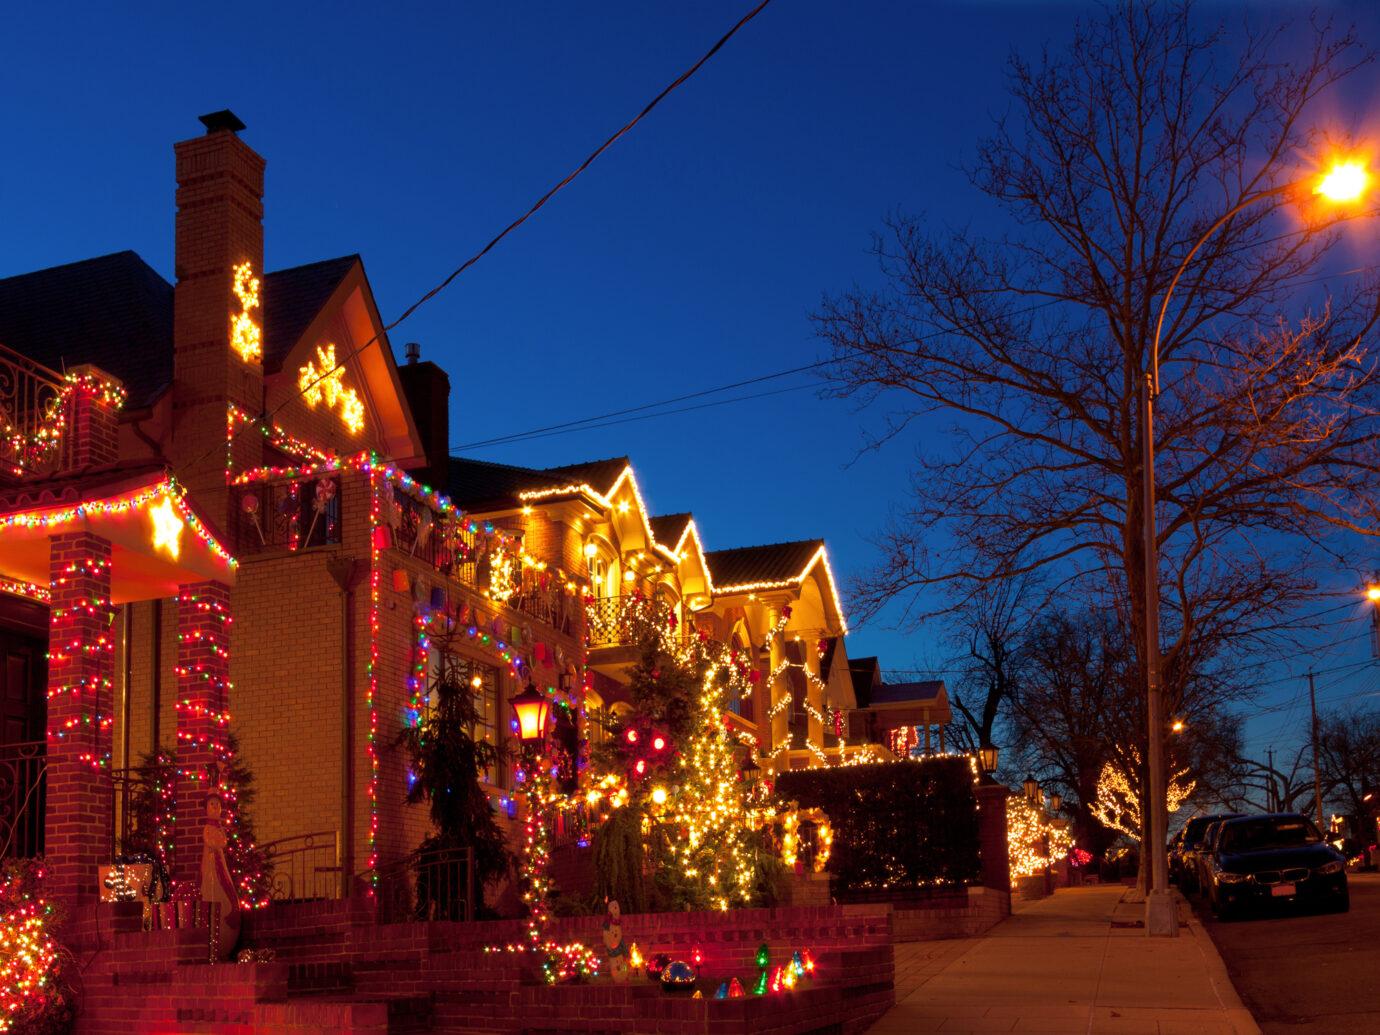 Homes with Christmas Lights in Dyker Heights neighbourhood of Brooklyn, New York, USA.